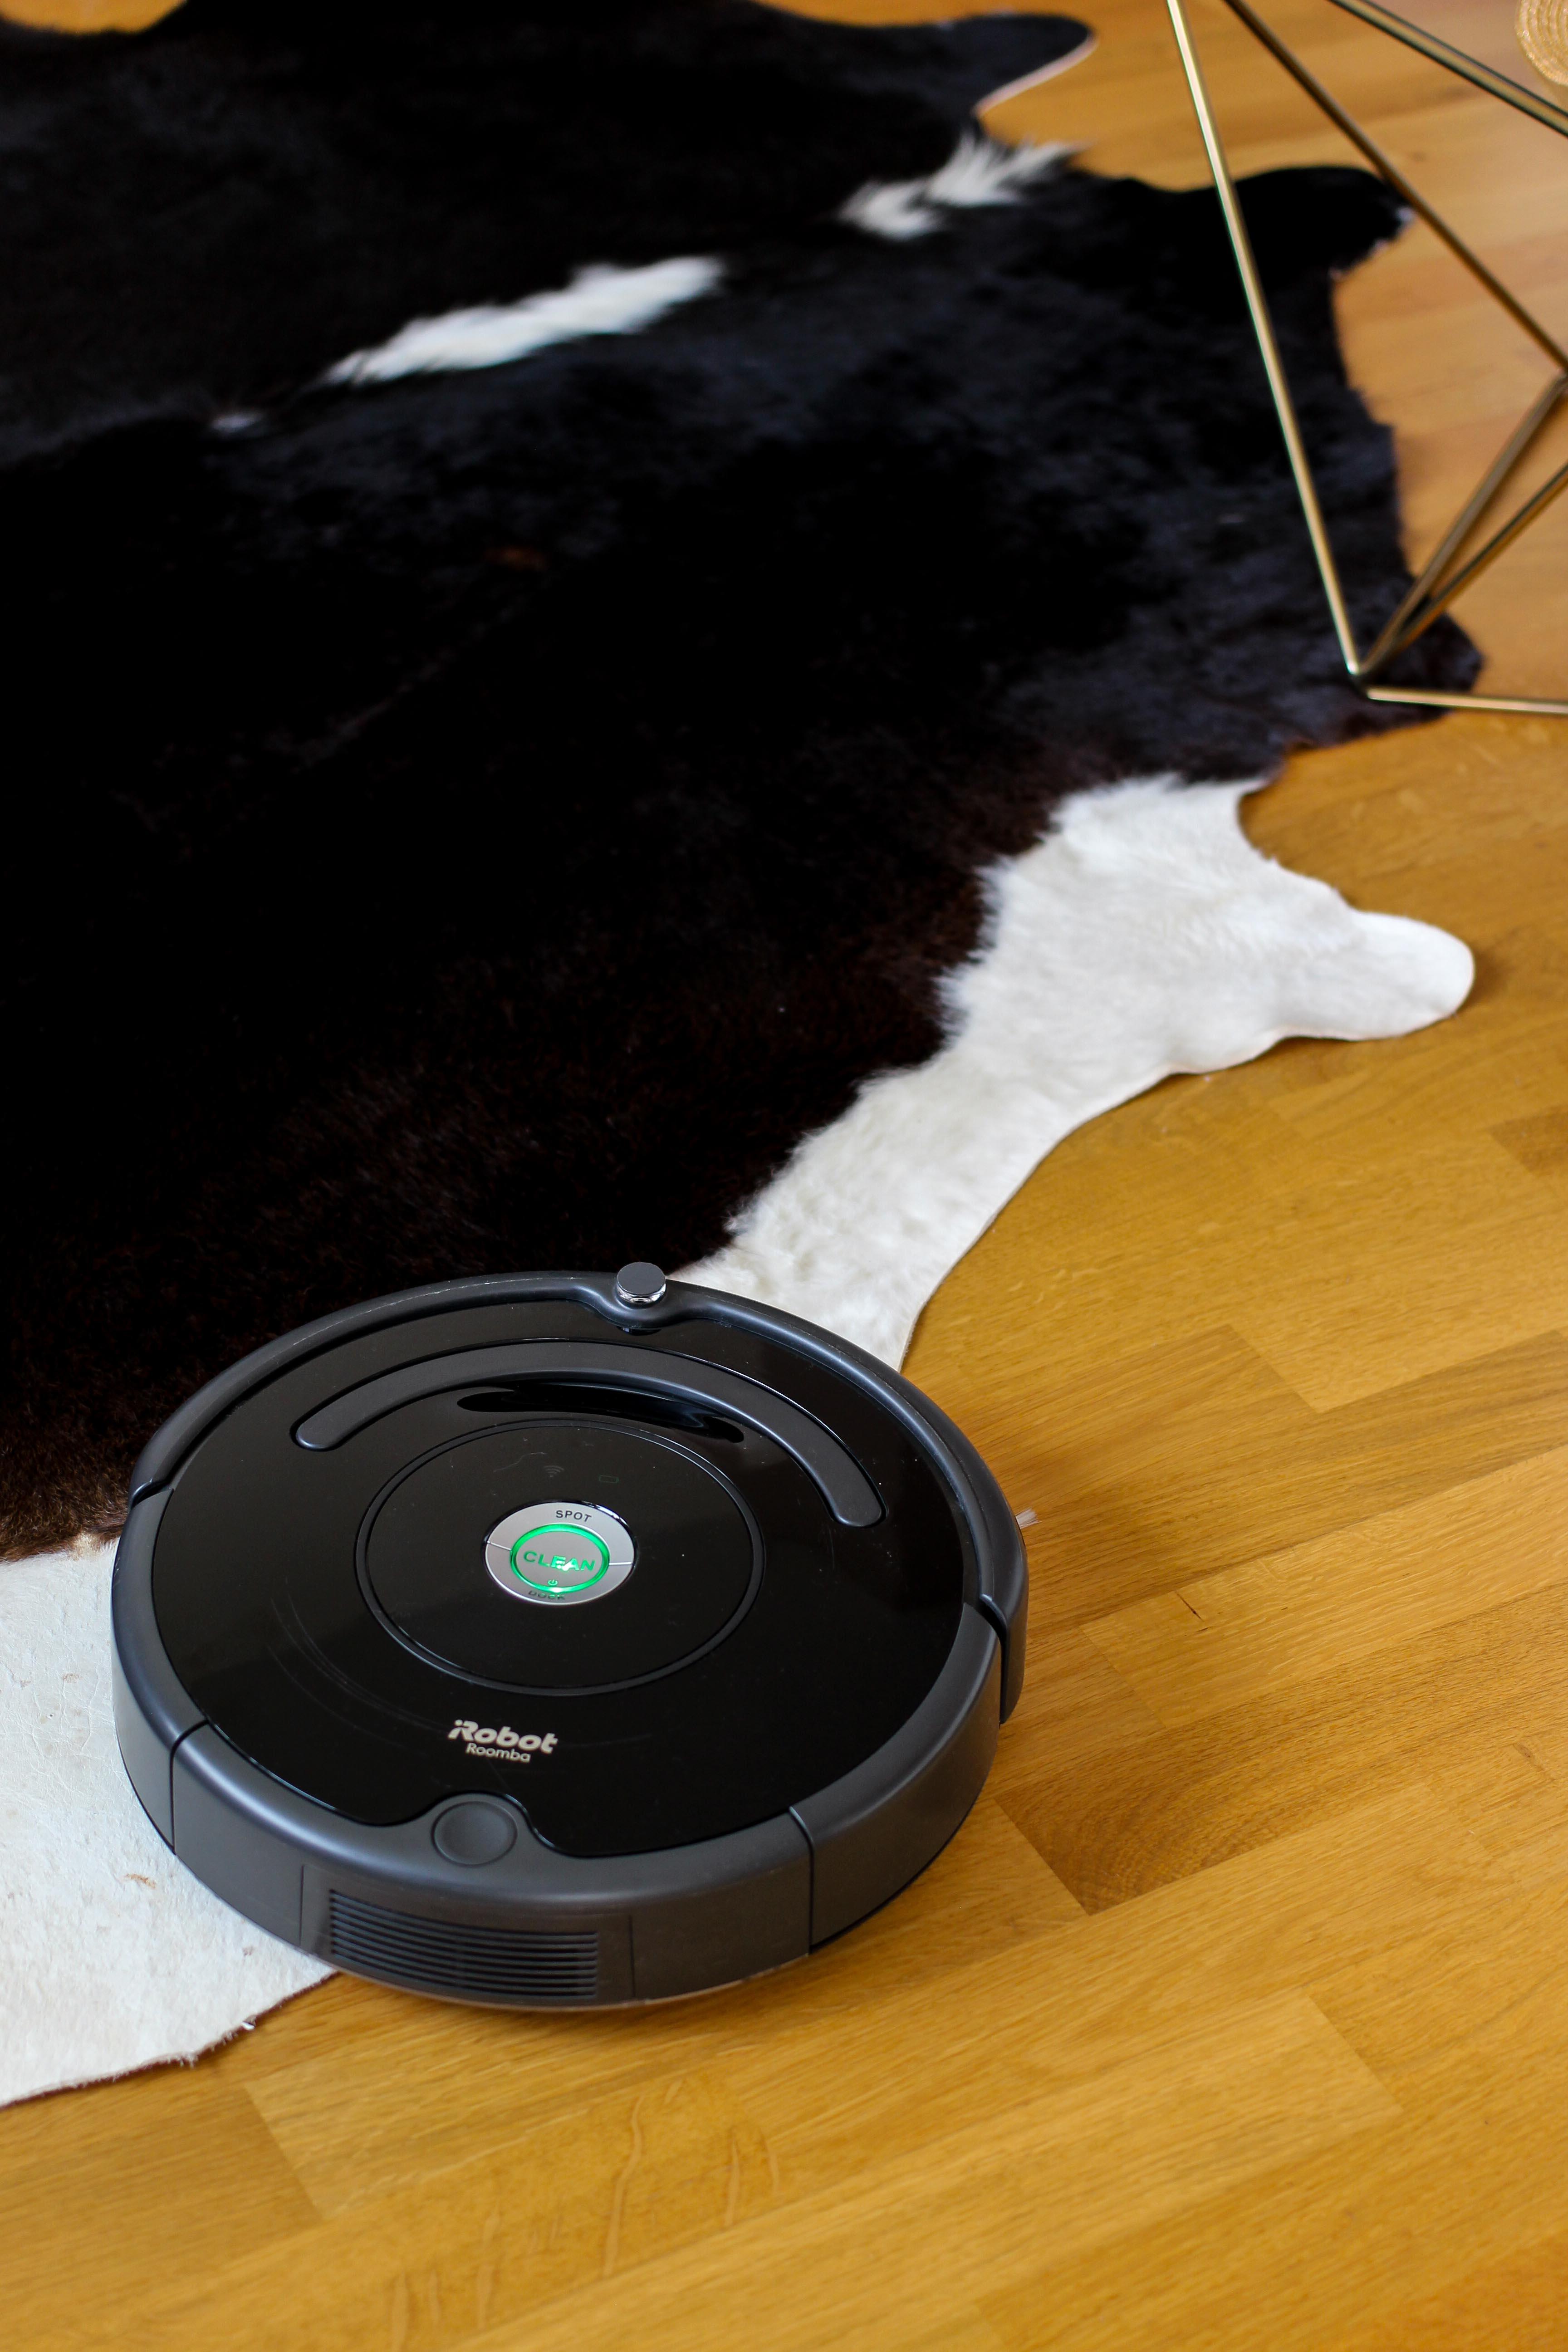 Amazon IRobot Roomba 671 Saugroboter Bewertung Erfahrungsbericht Staubsauger Ladestation Blogger Haushaltshilfe Saugroboter Test 2018